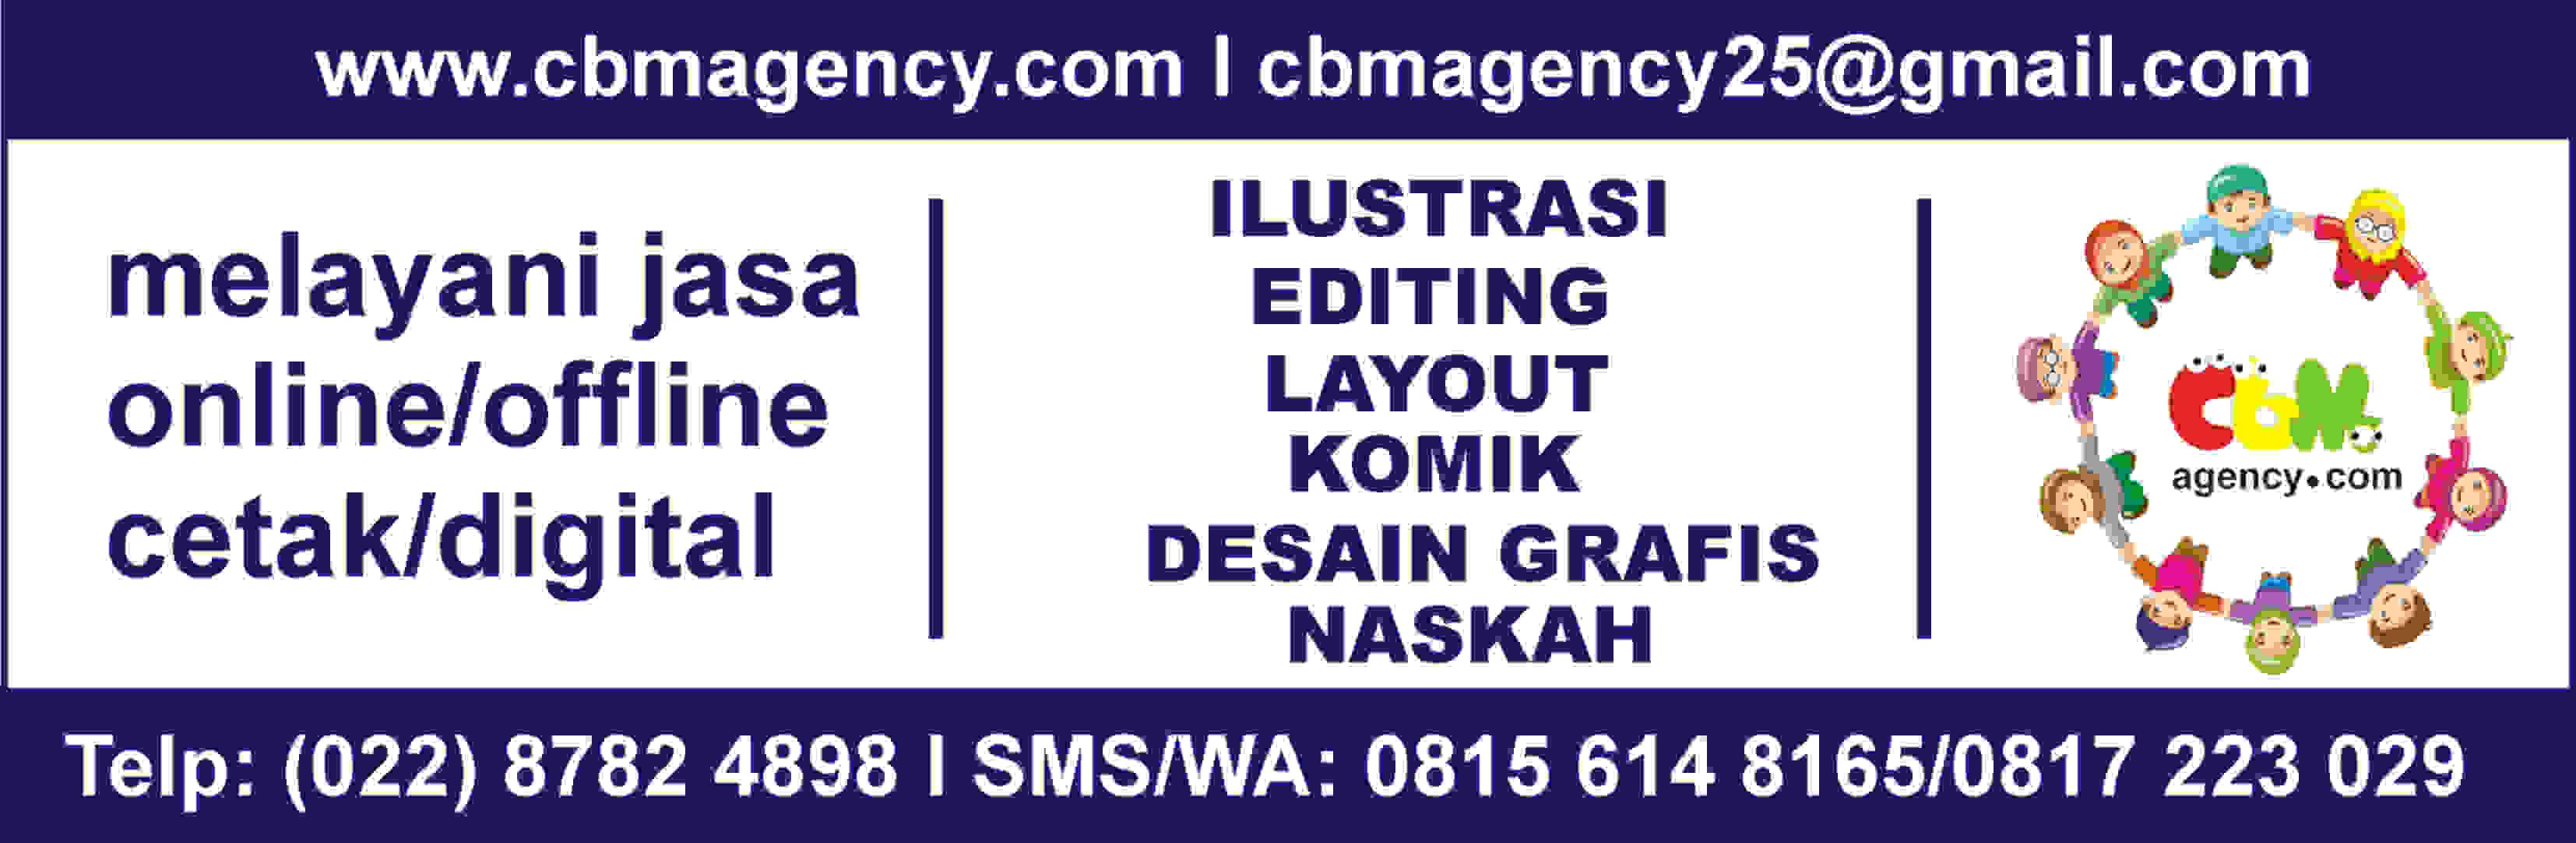 iklan banner cbm agency 3 agustus 16